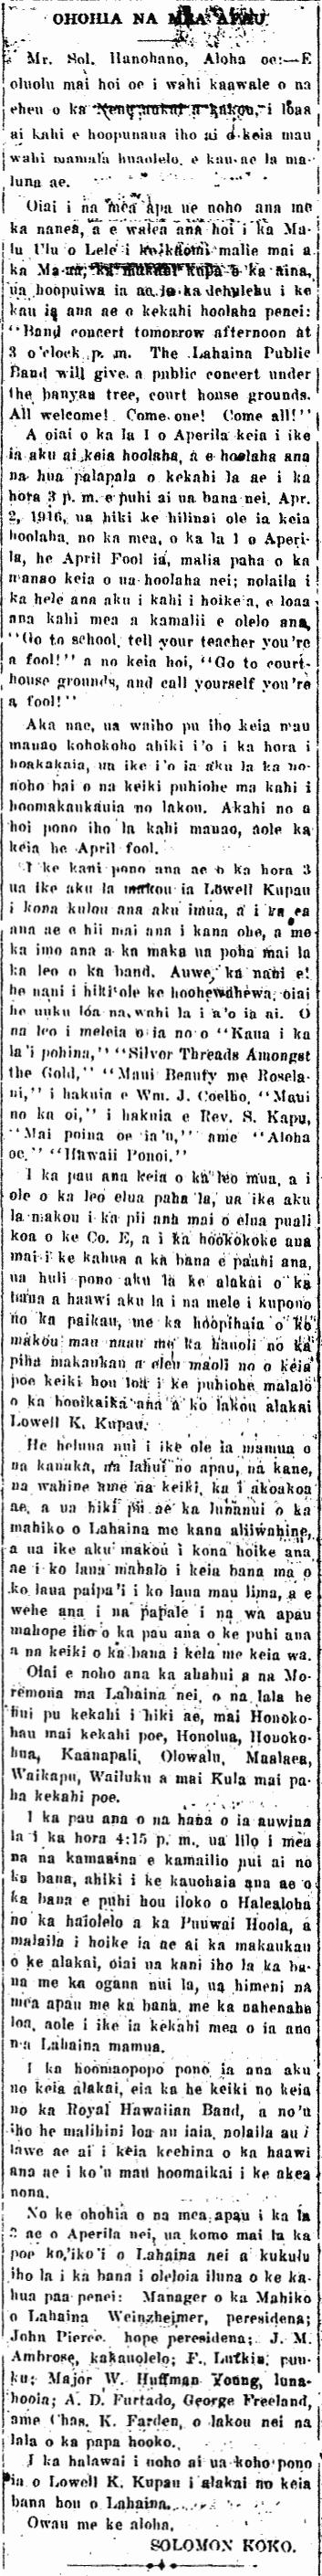 Kuokoa_4_21_1916_5